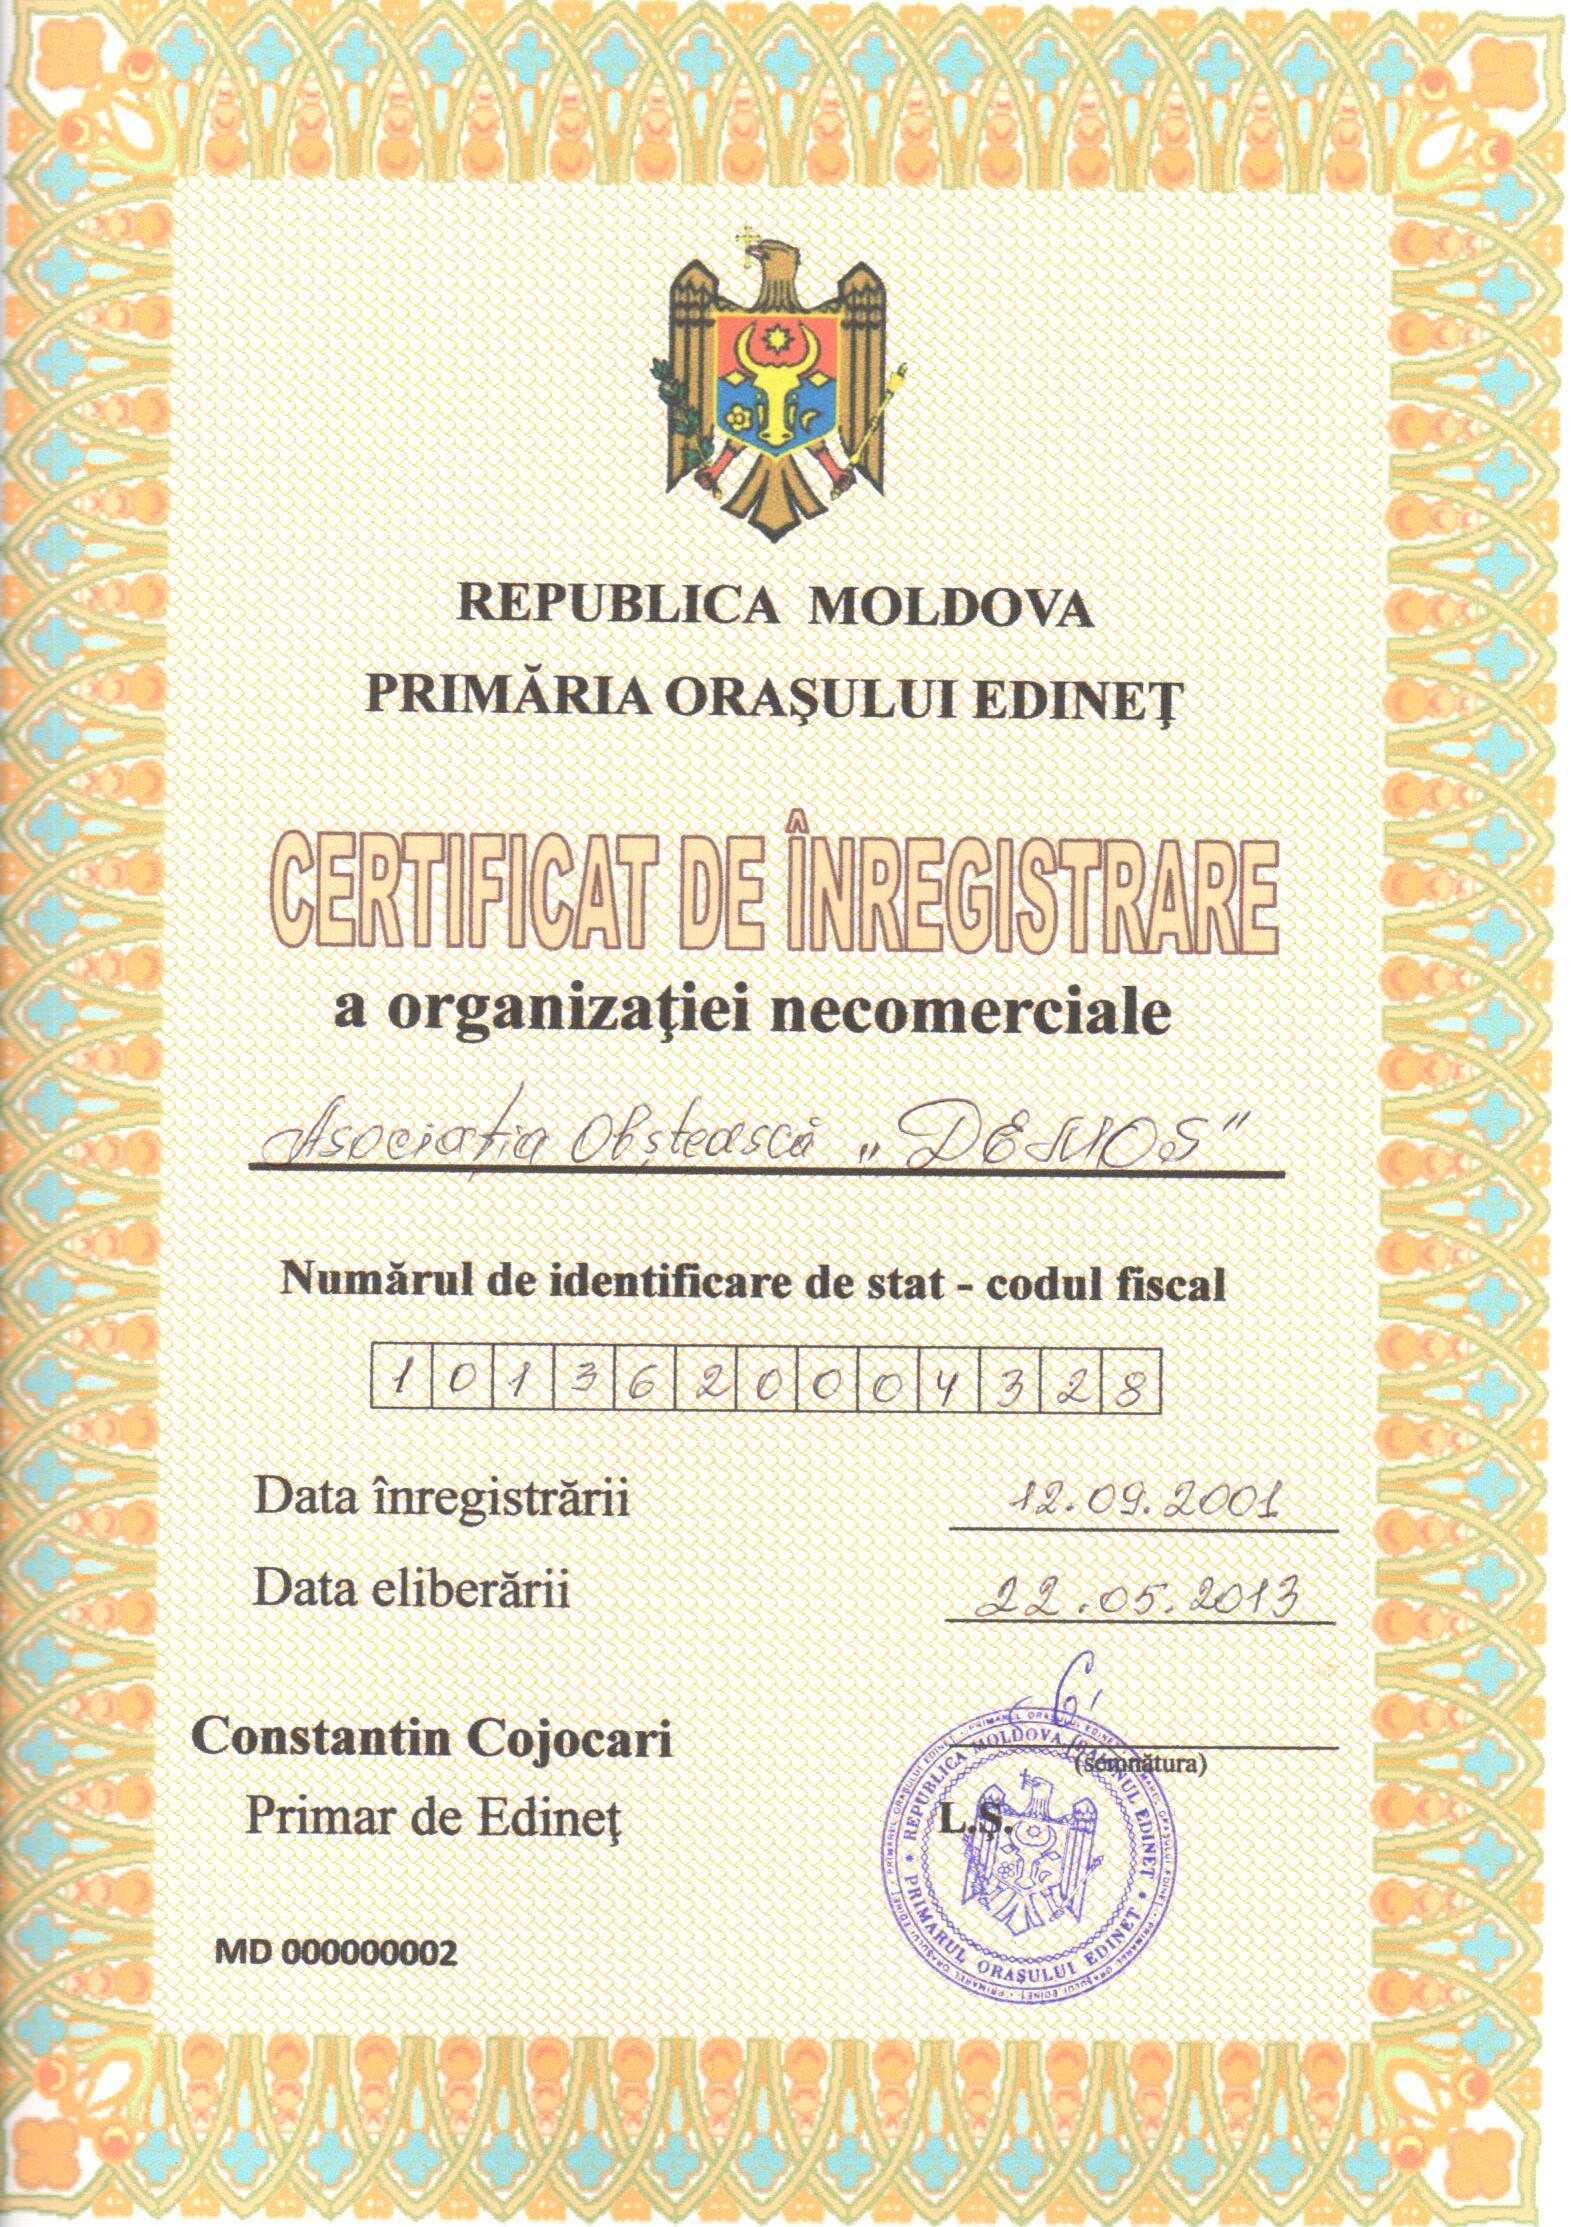 Copy of registration certificate_DEMOS